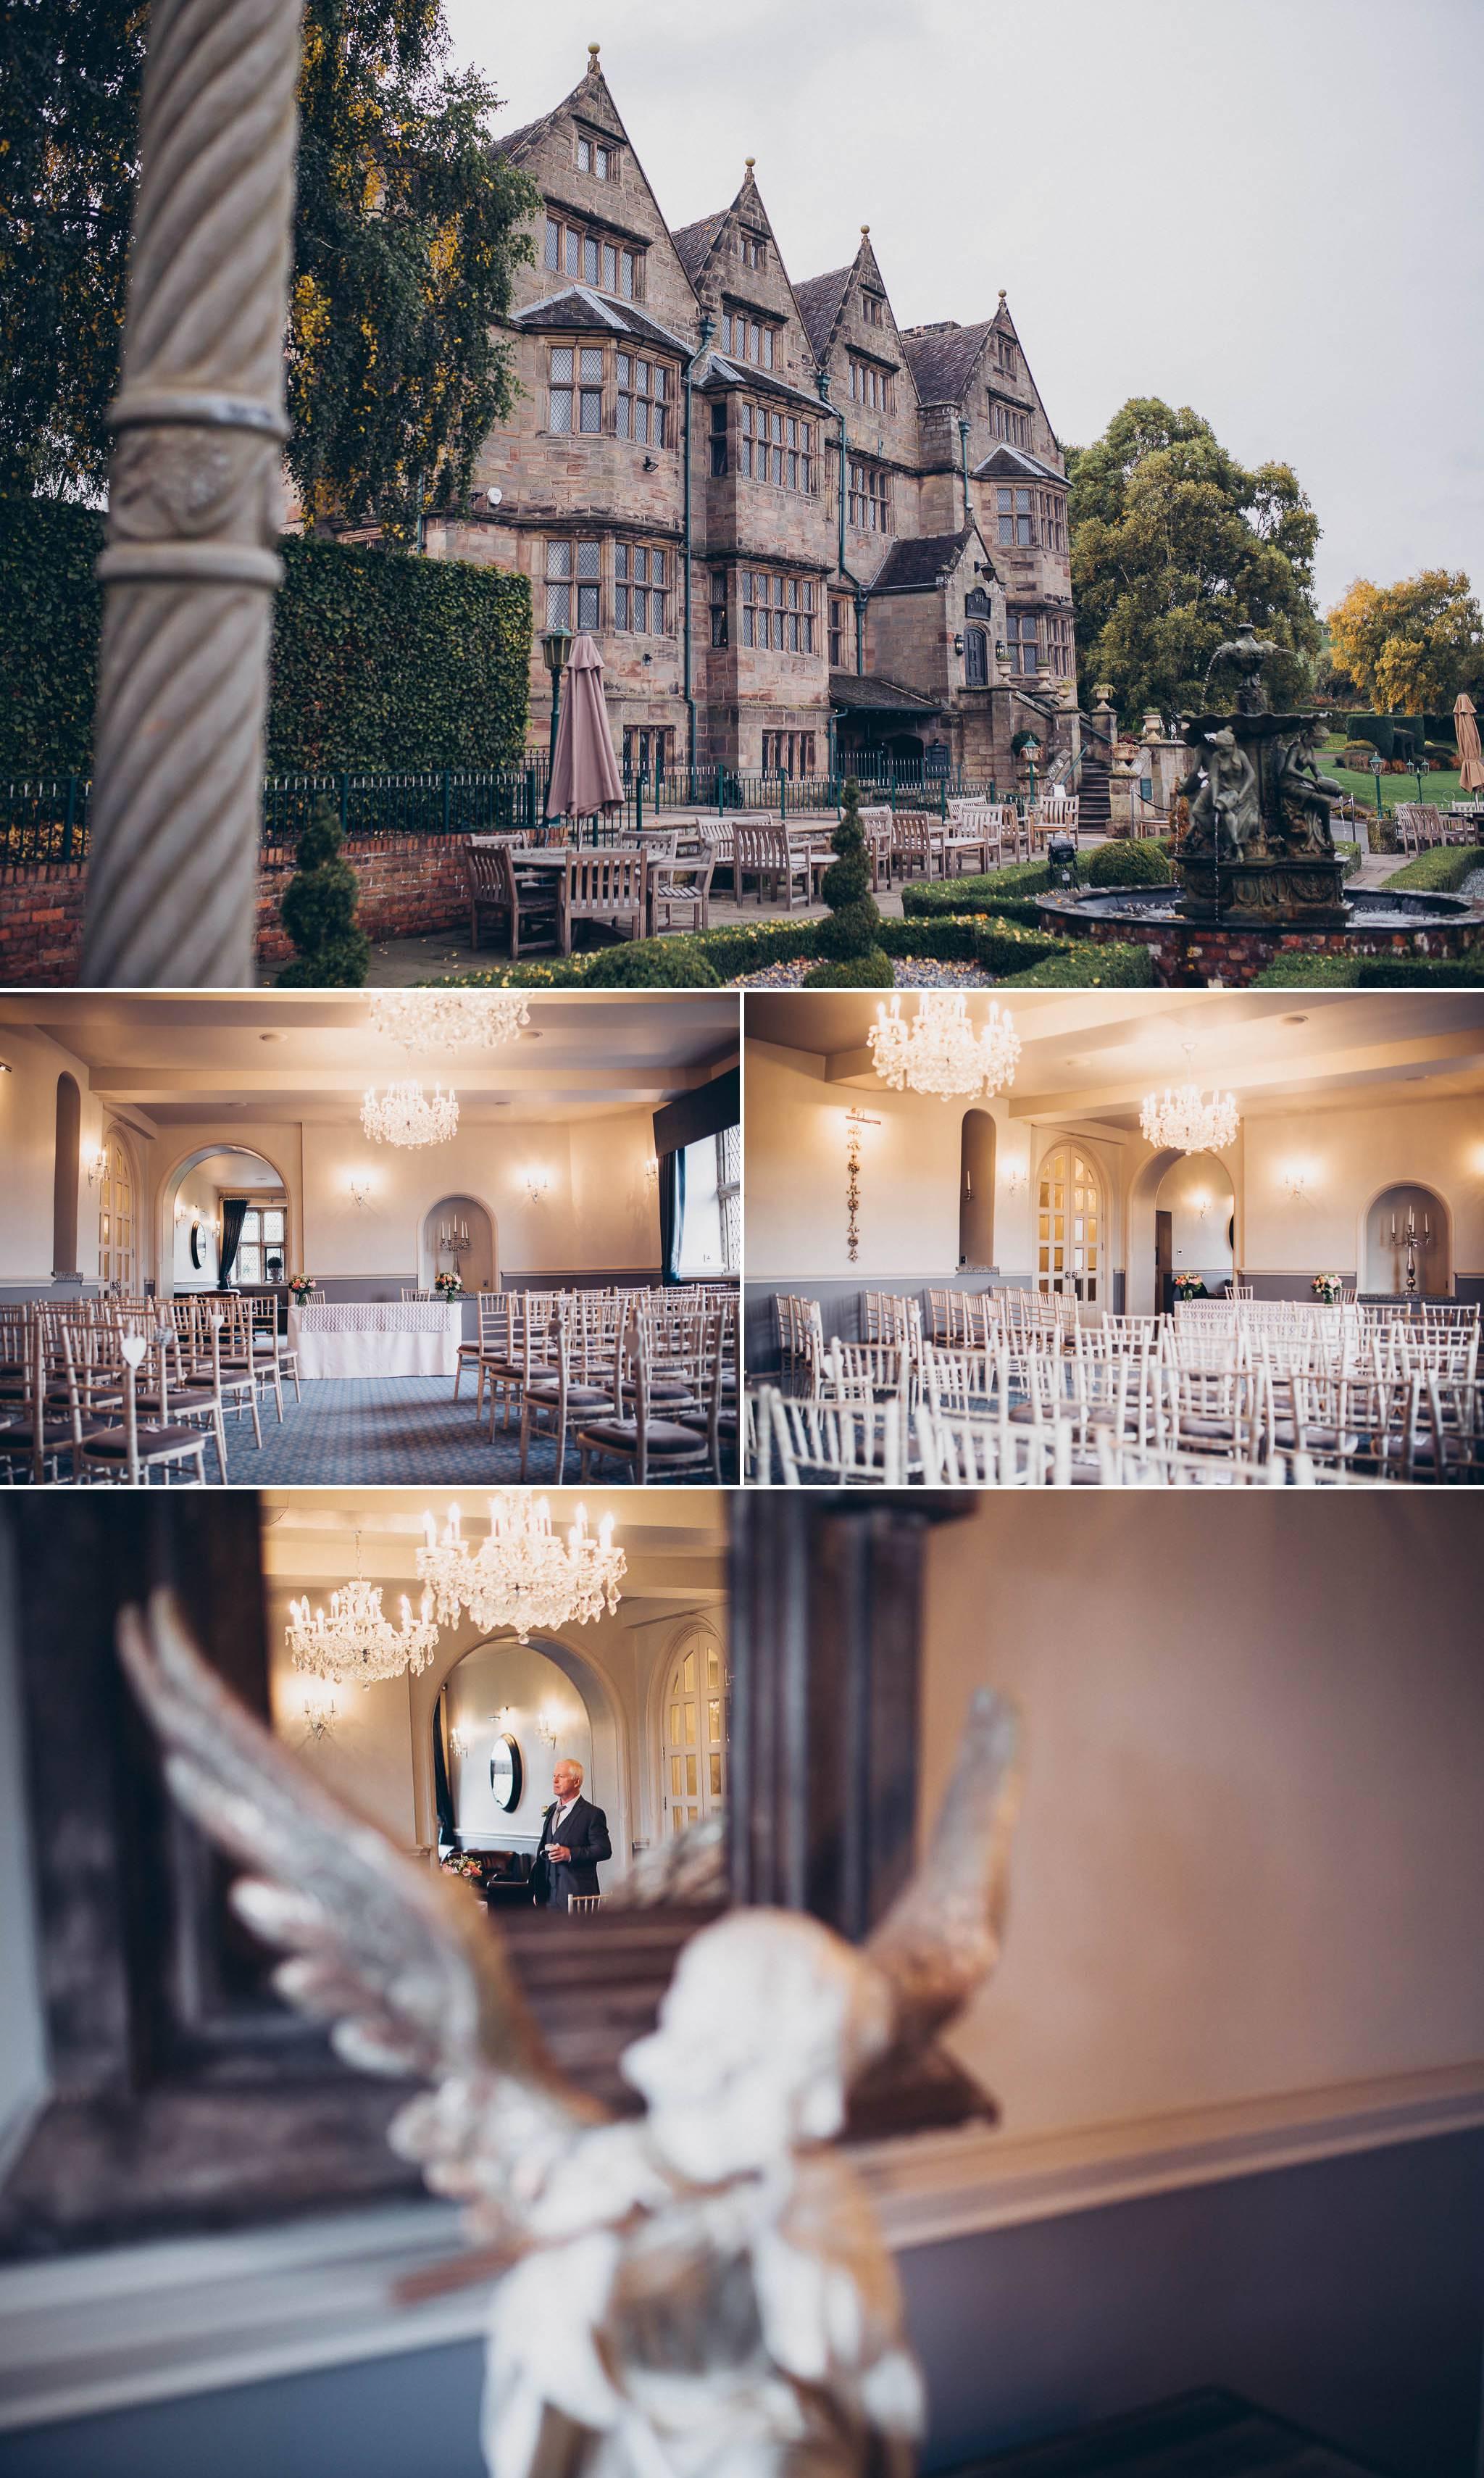 weston-hall-wedding-photographer 1.jpg